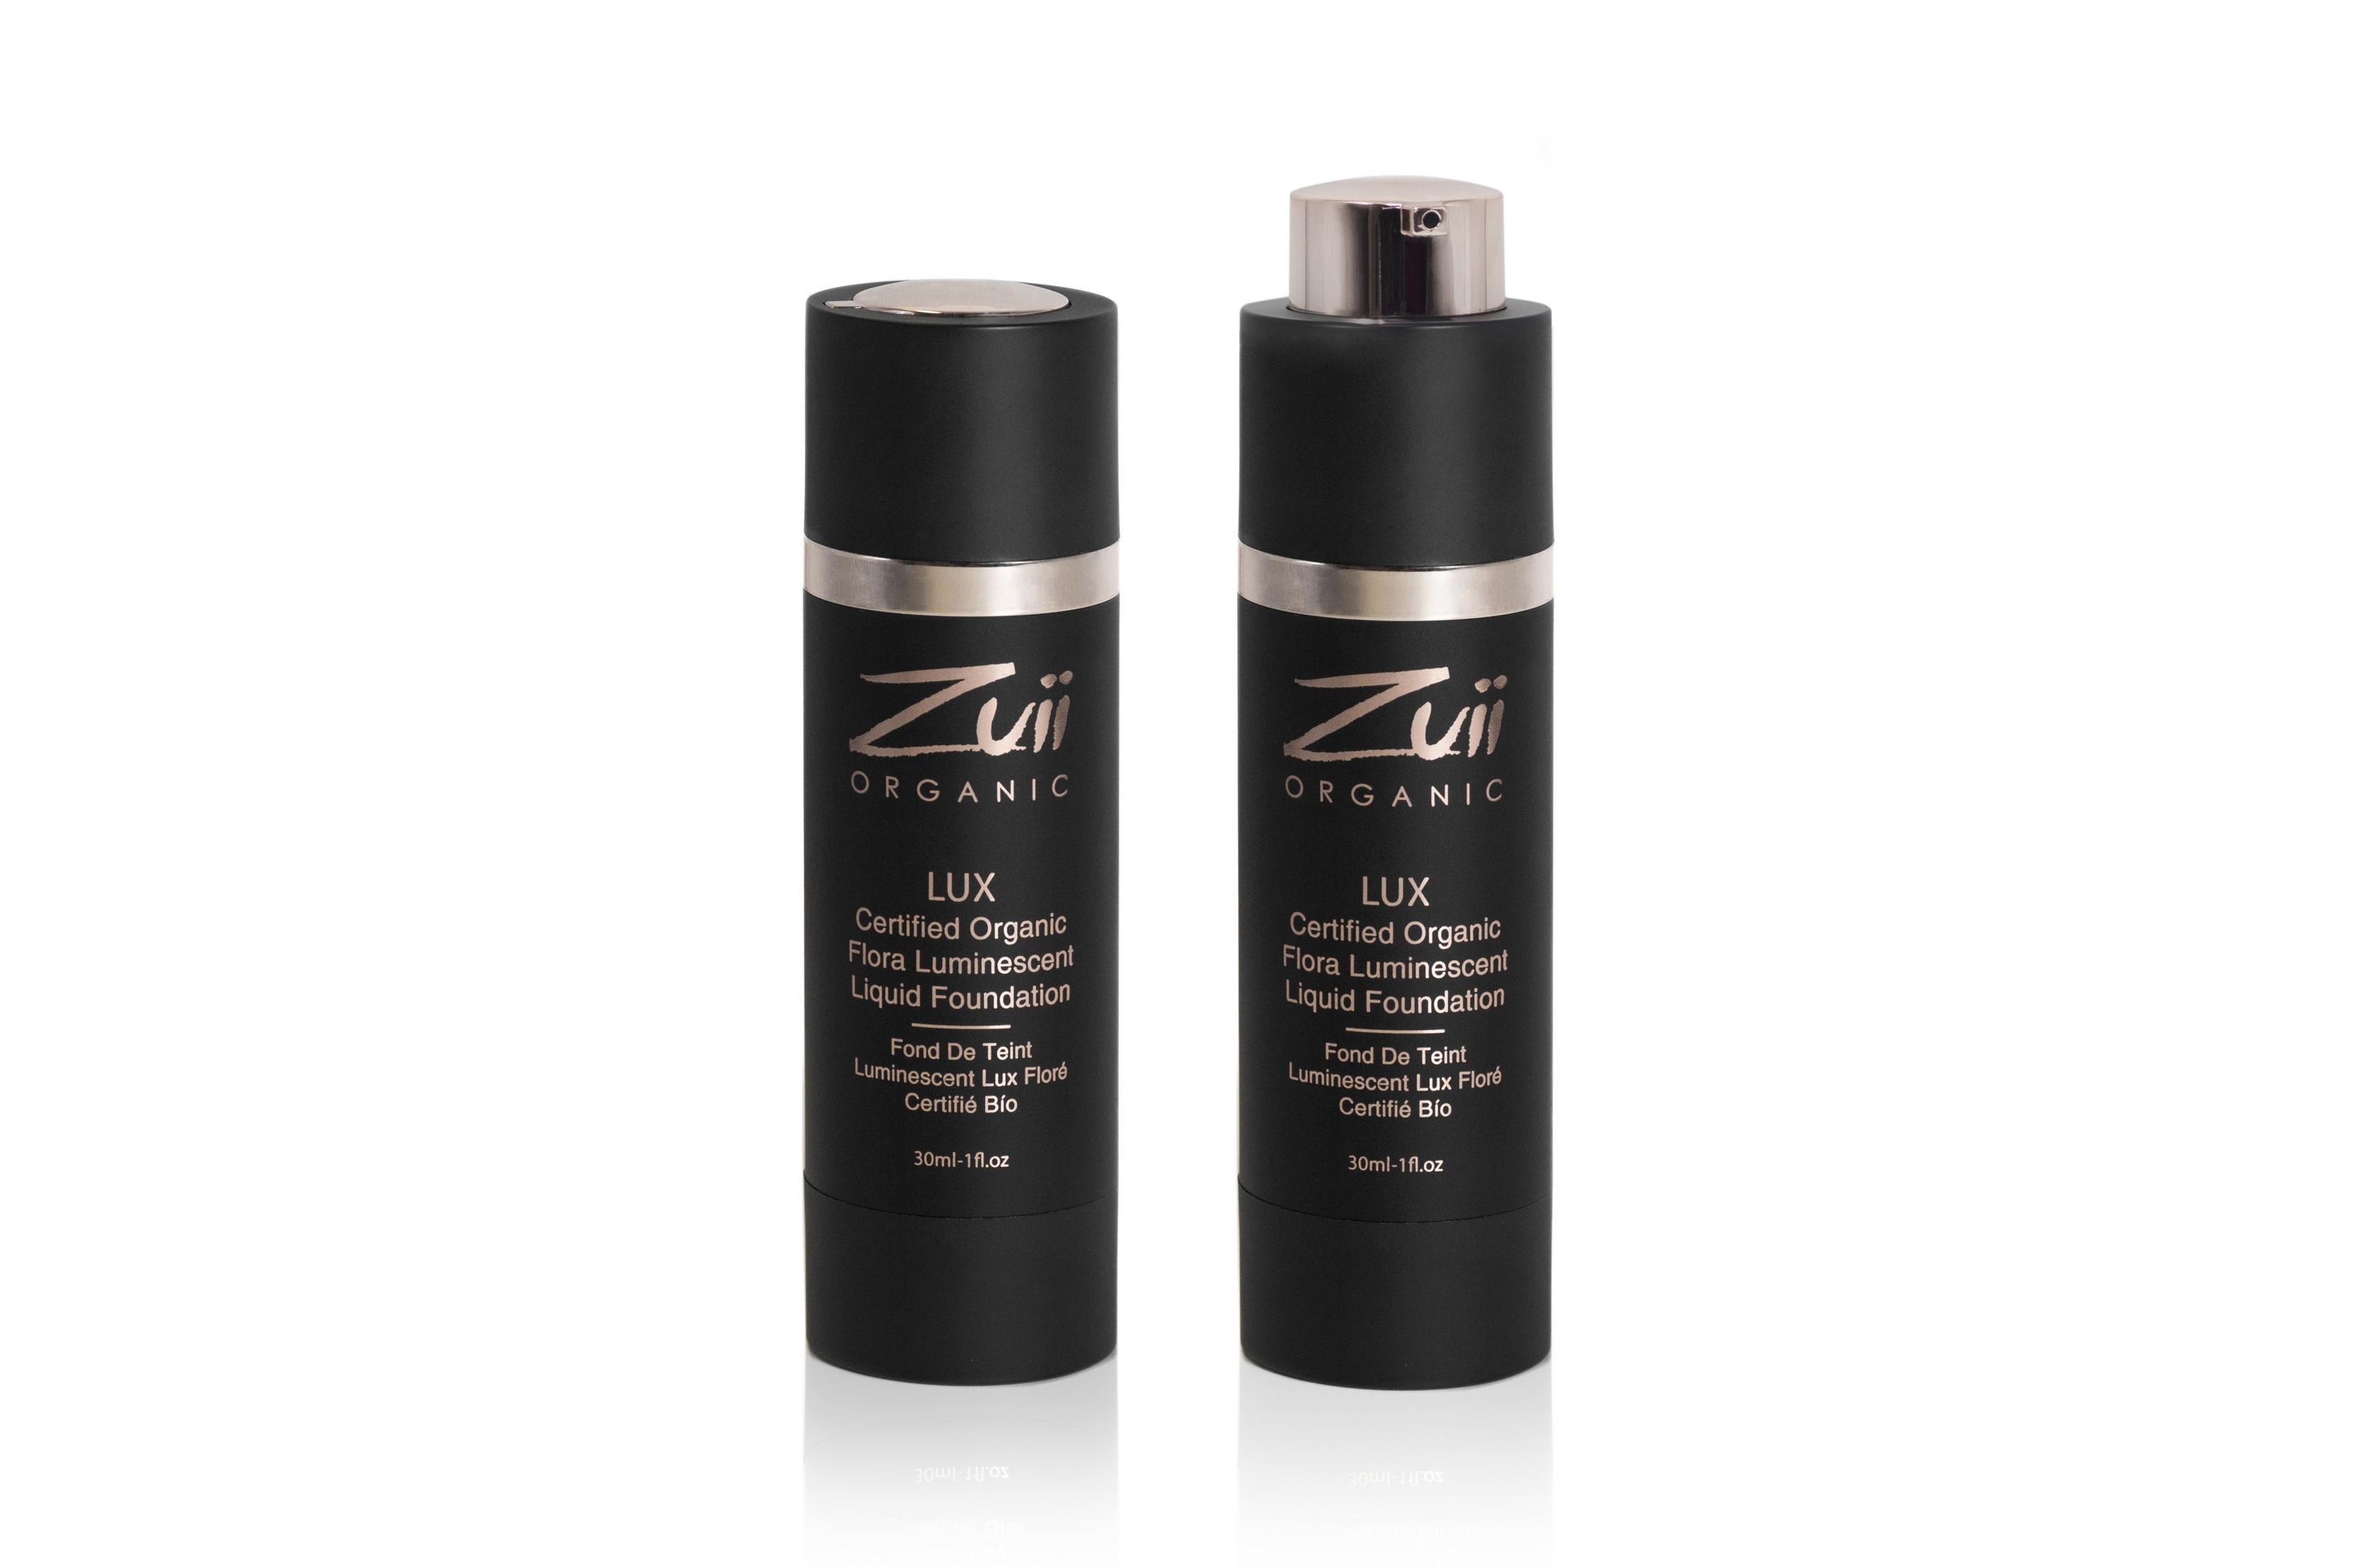 Zuii Organic Meikkivoide Lux Luminescent Driftwood 30 ml